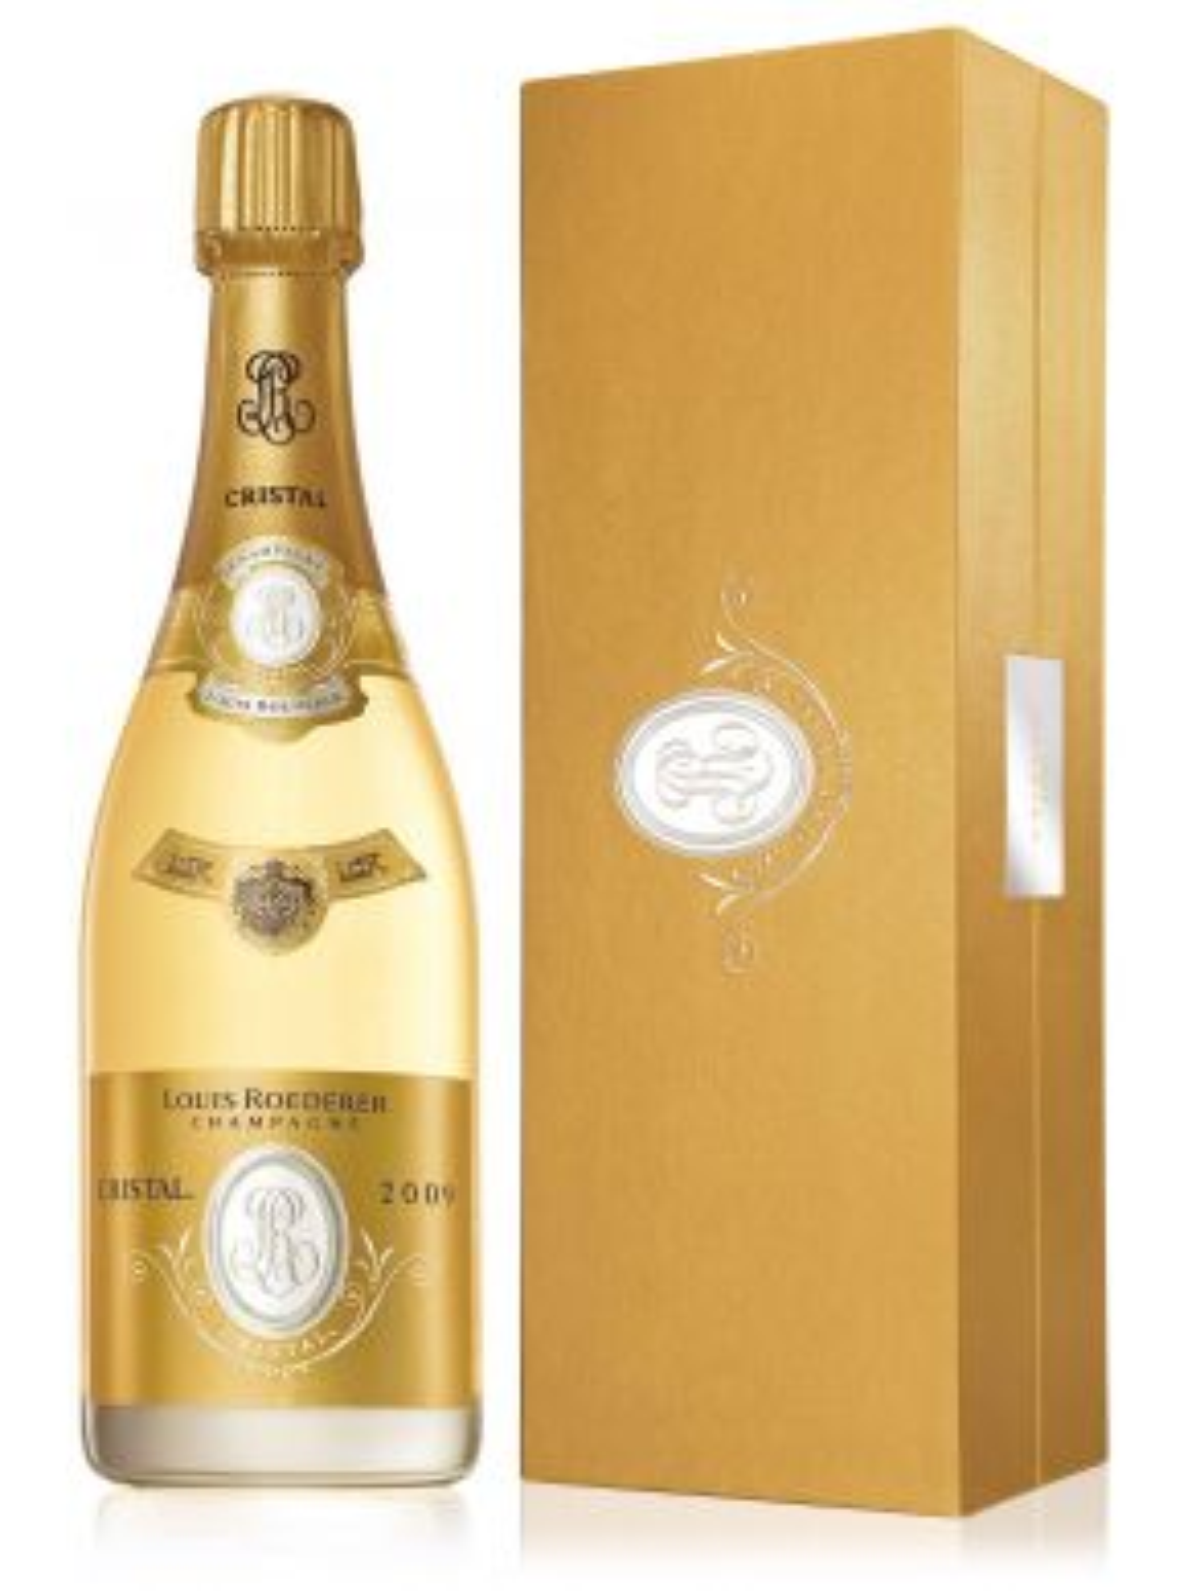 Louis Roederer Cristal 2009 Vintage Champagne 75cl Gift Box